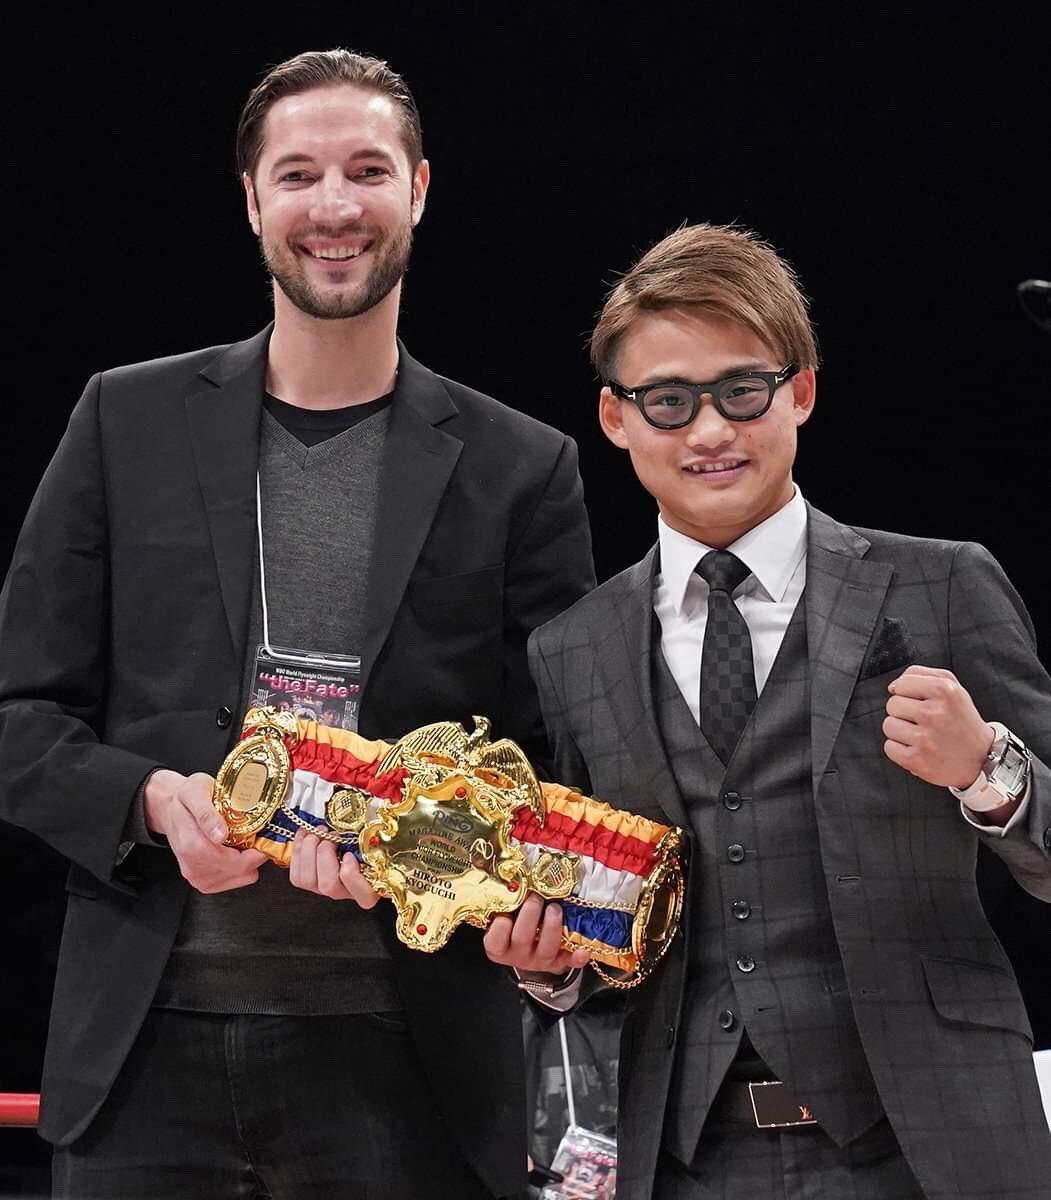 D17vQiJUYAAu25k - Hiroto Kyoguchi 'honored' to have received The Ring 108-pound championship belt